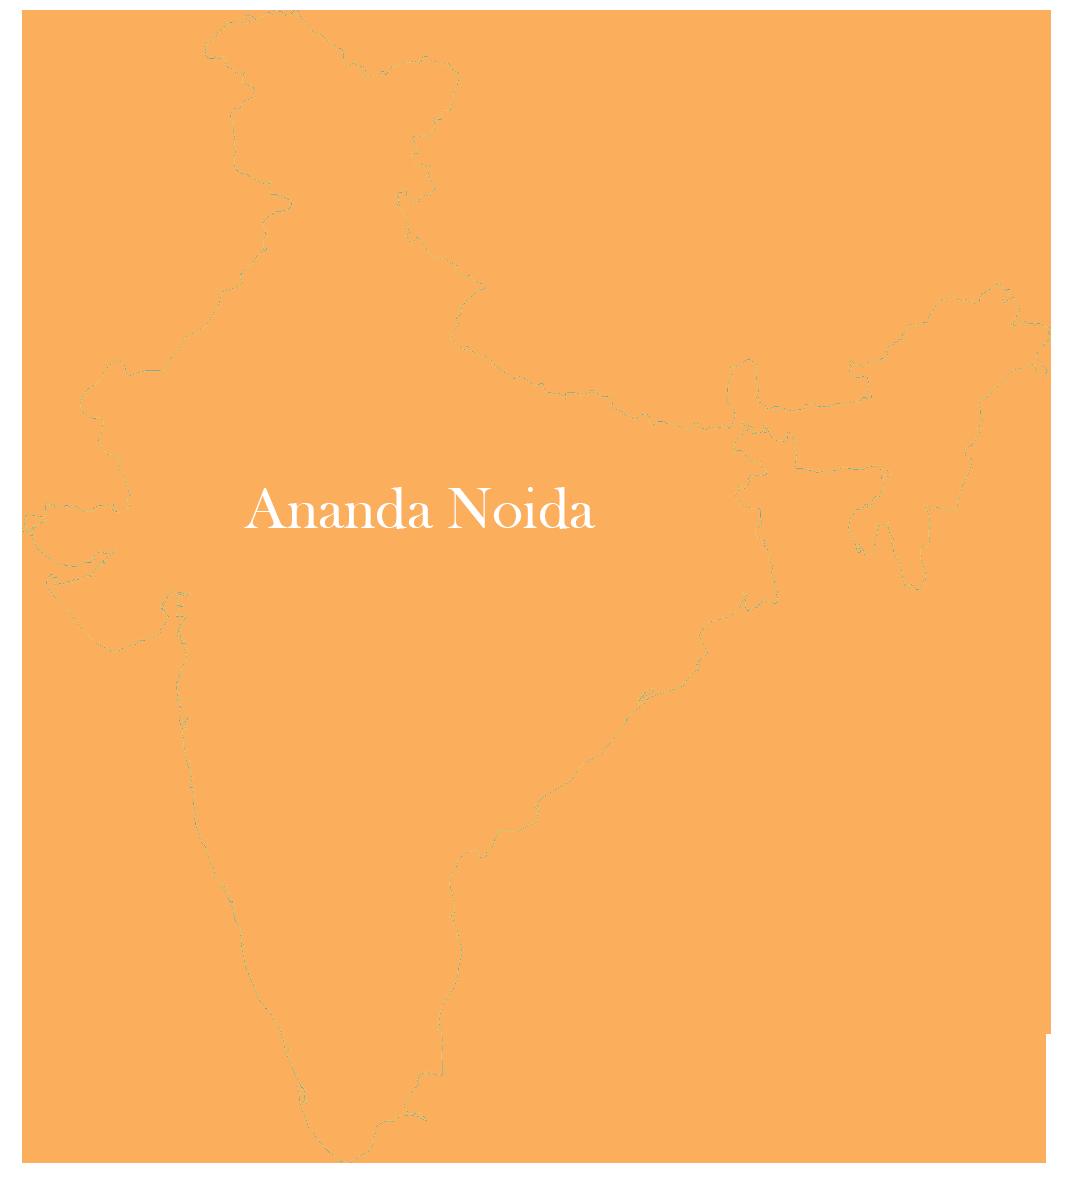 Ananda Noida